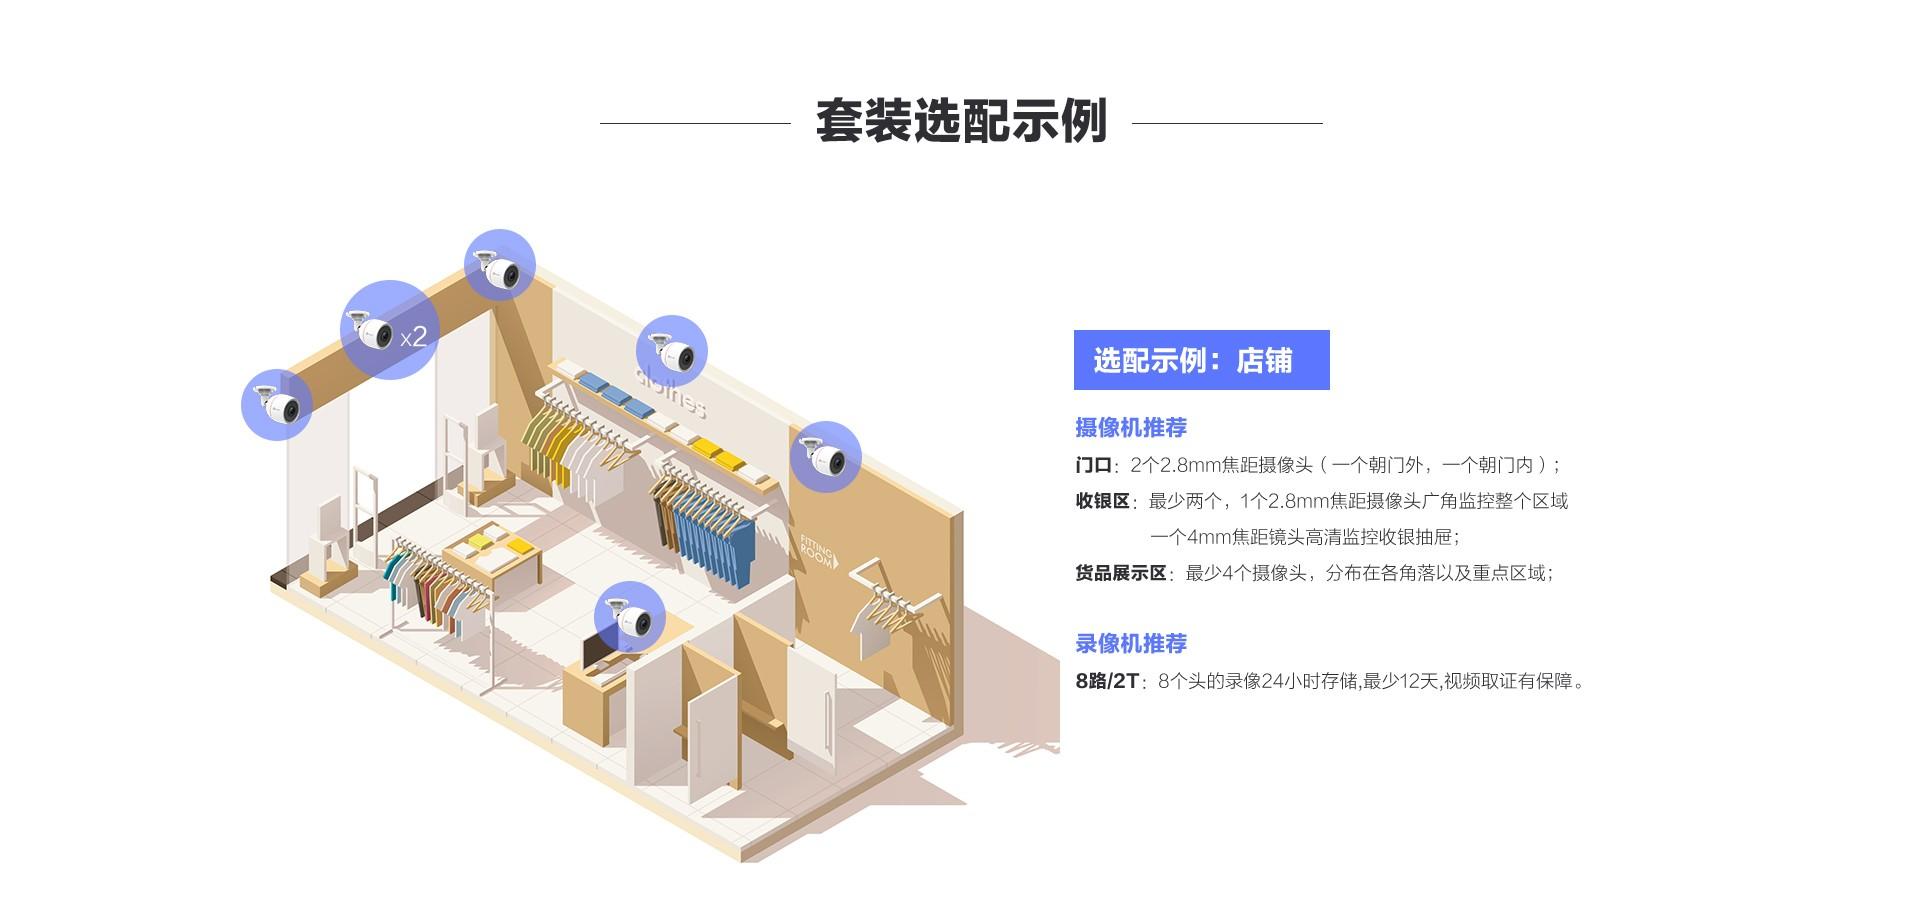 C3T+X5SC-web_19.jpg